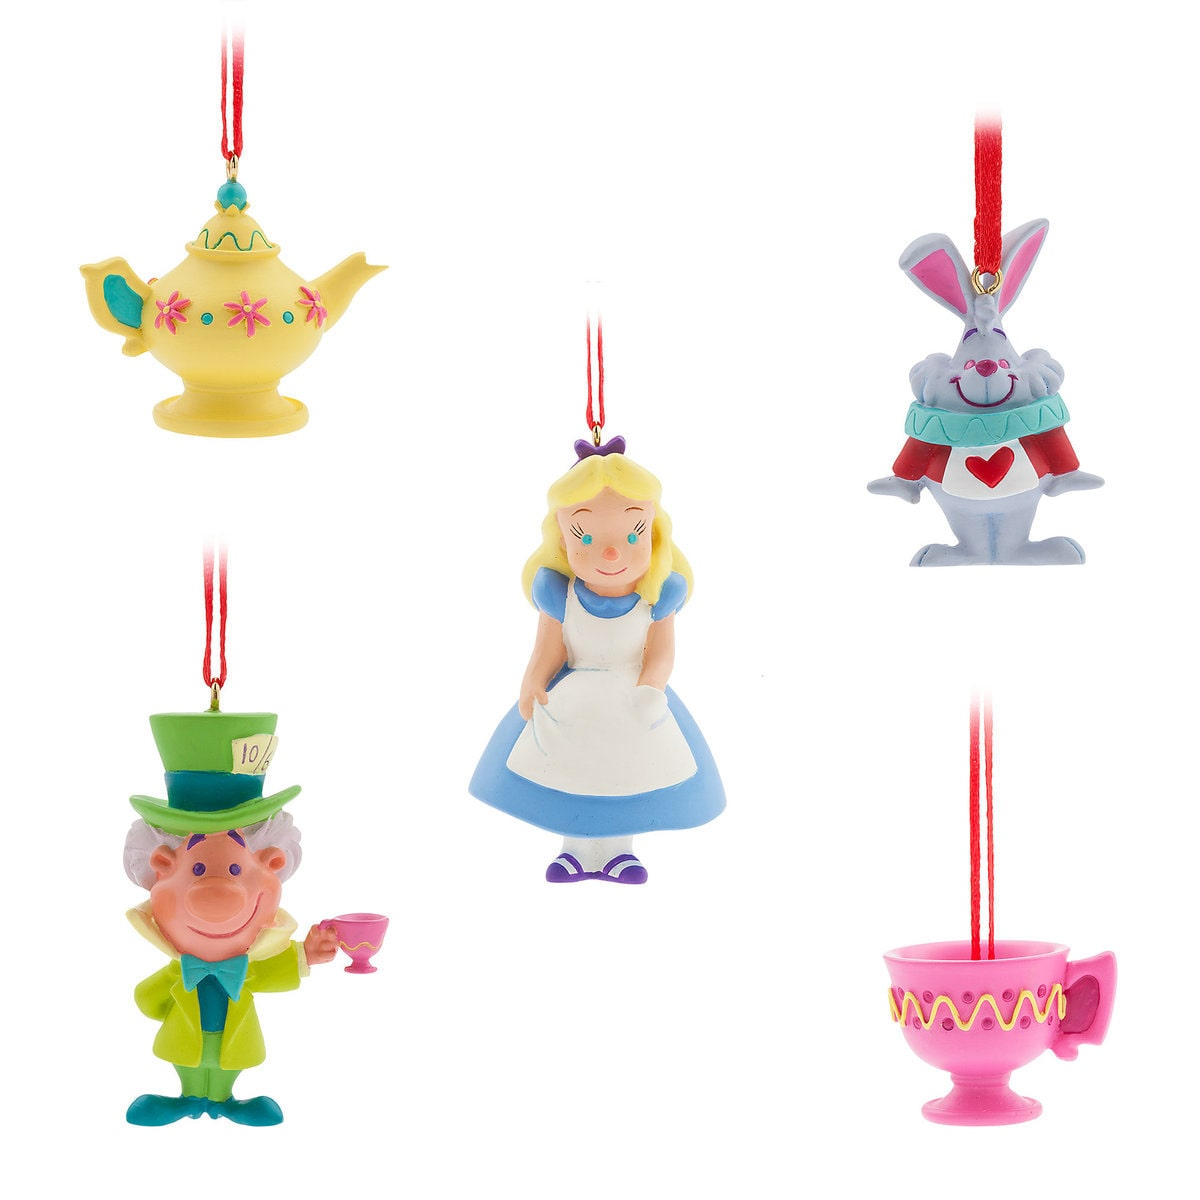 Alice in Wonderland Sketchbook Mini Ornament Set